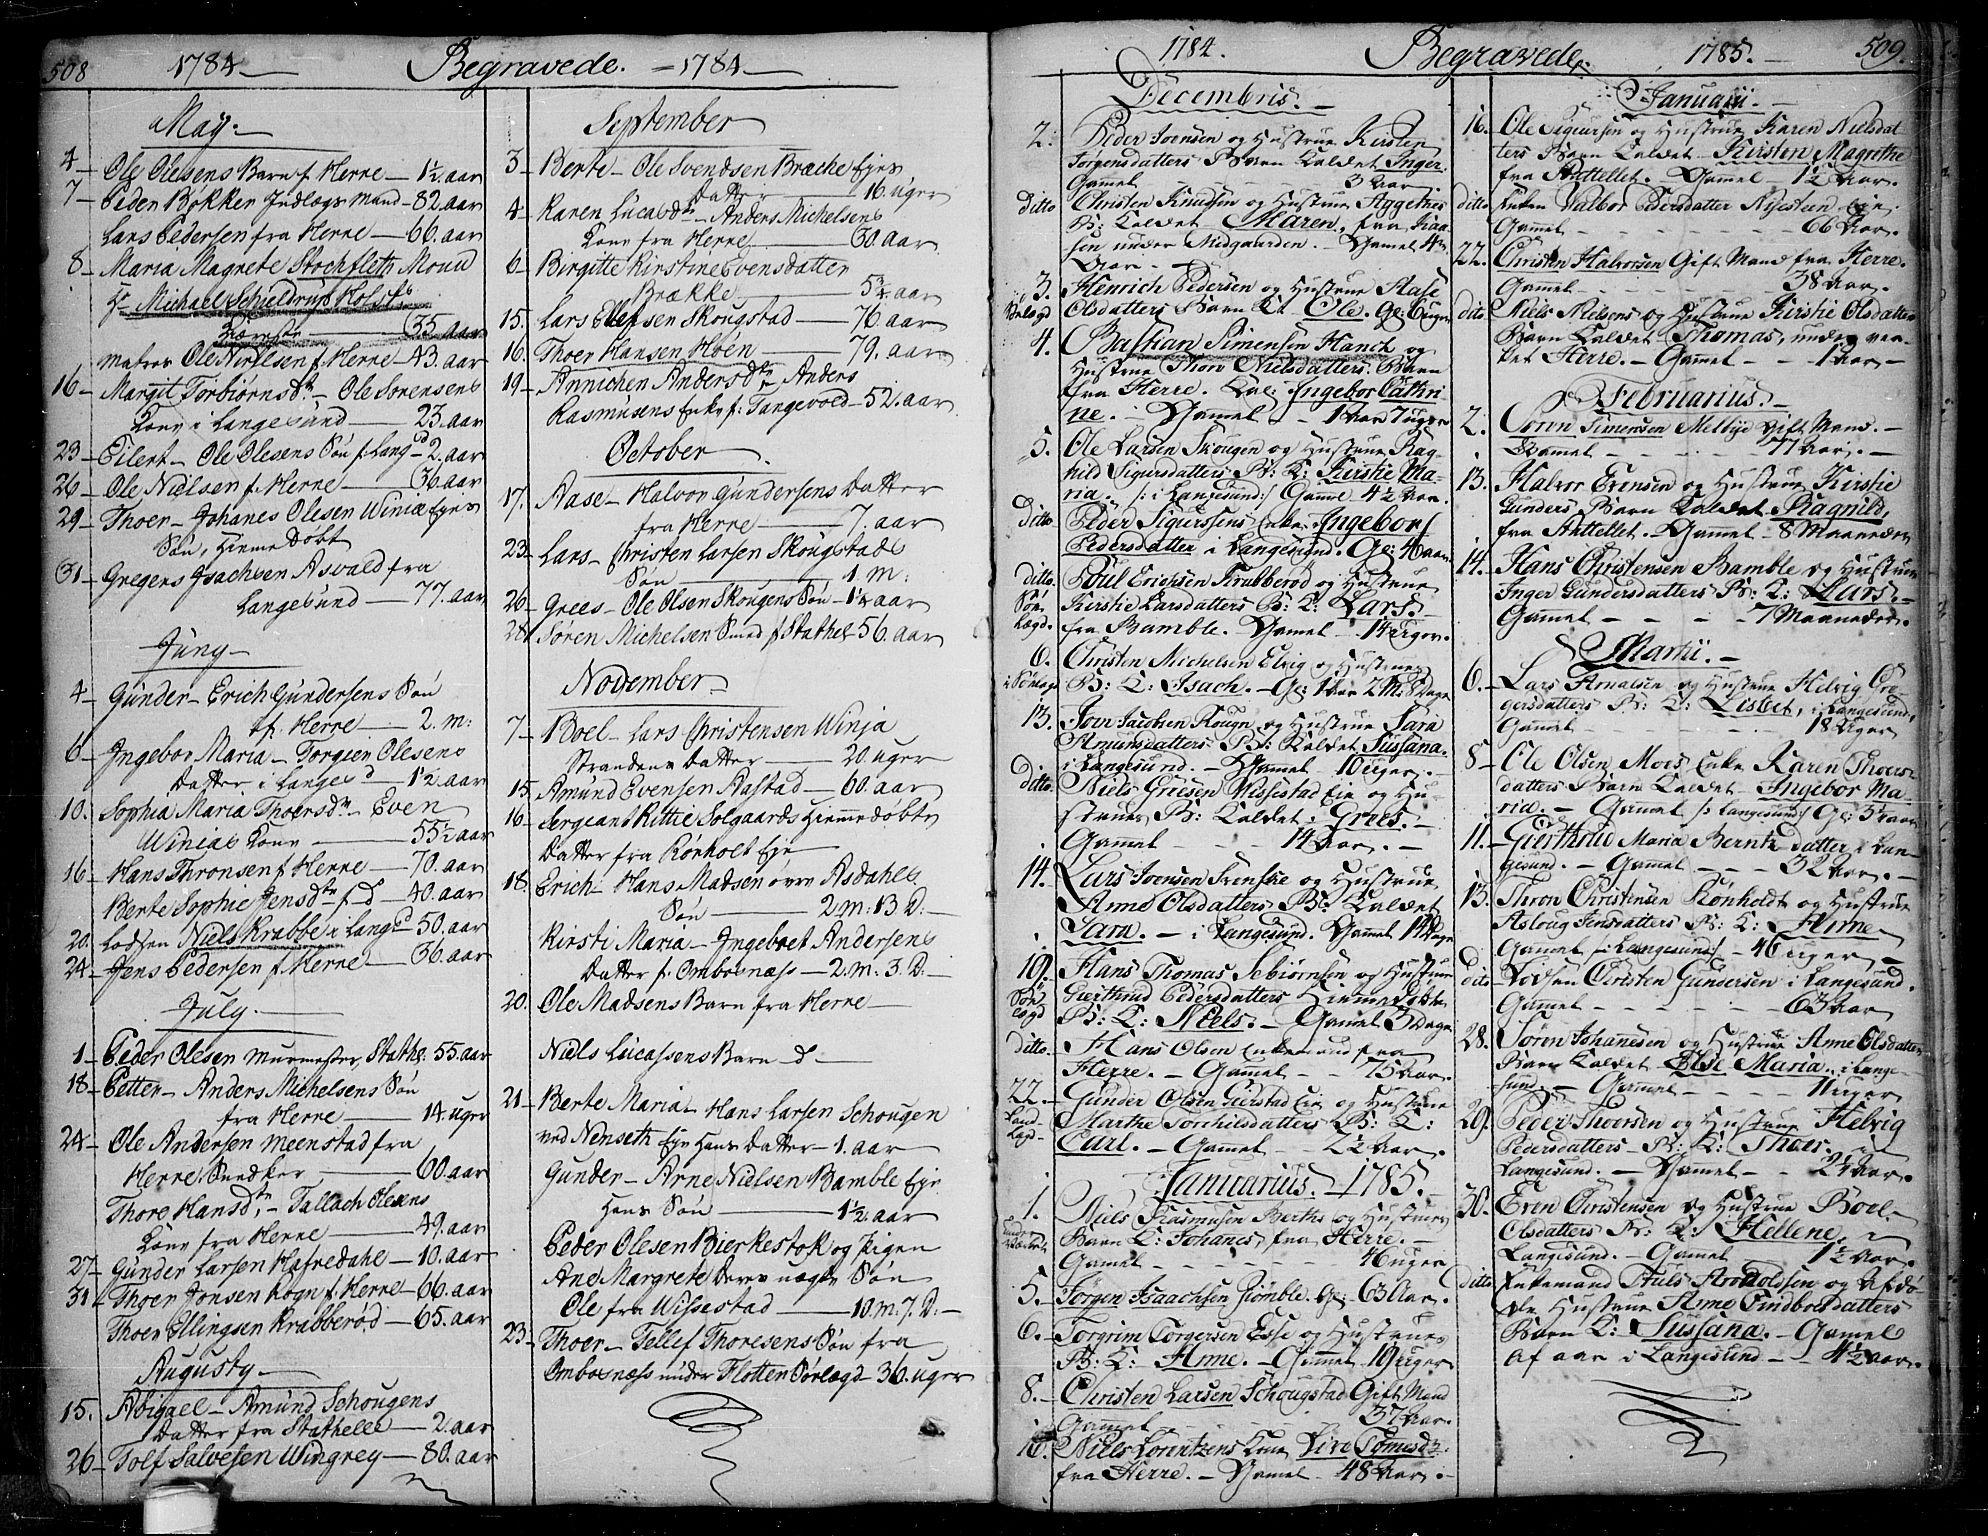 SAKO, Bamble kirkebøker, F/Fa/L0002: Ministerialbok nr. I 2, 1775-1814, s. 508-509